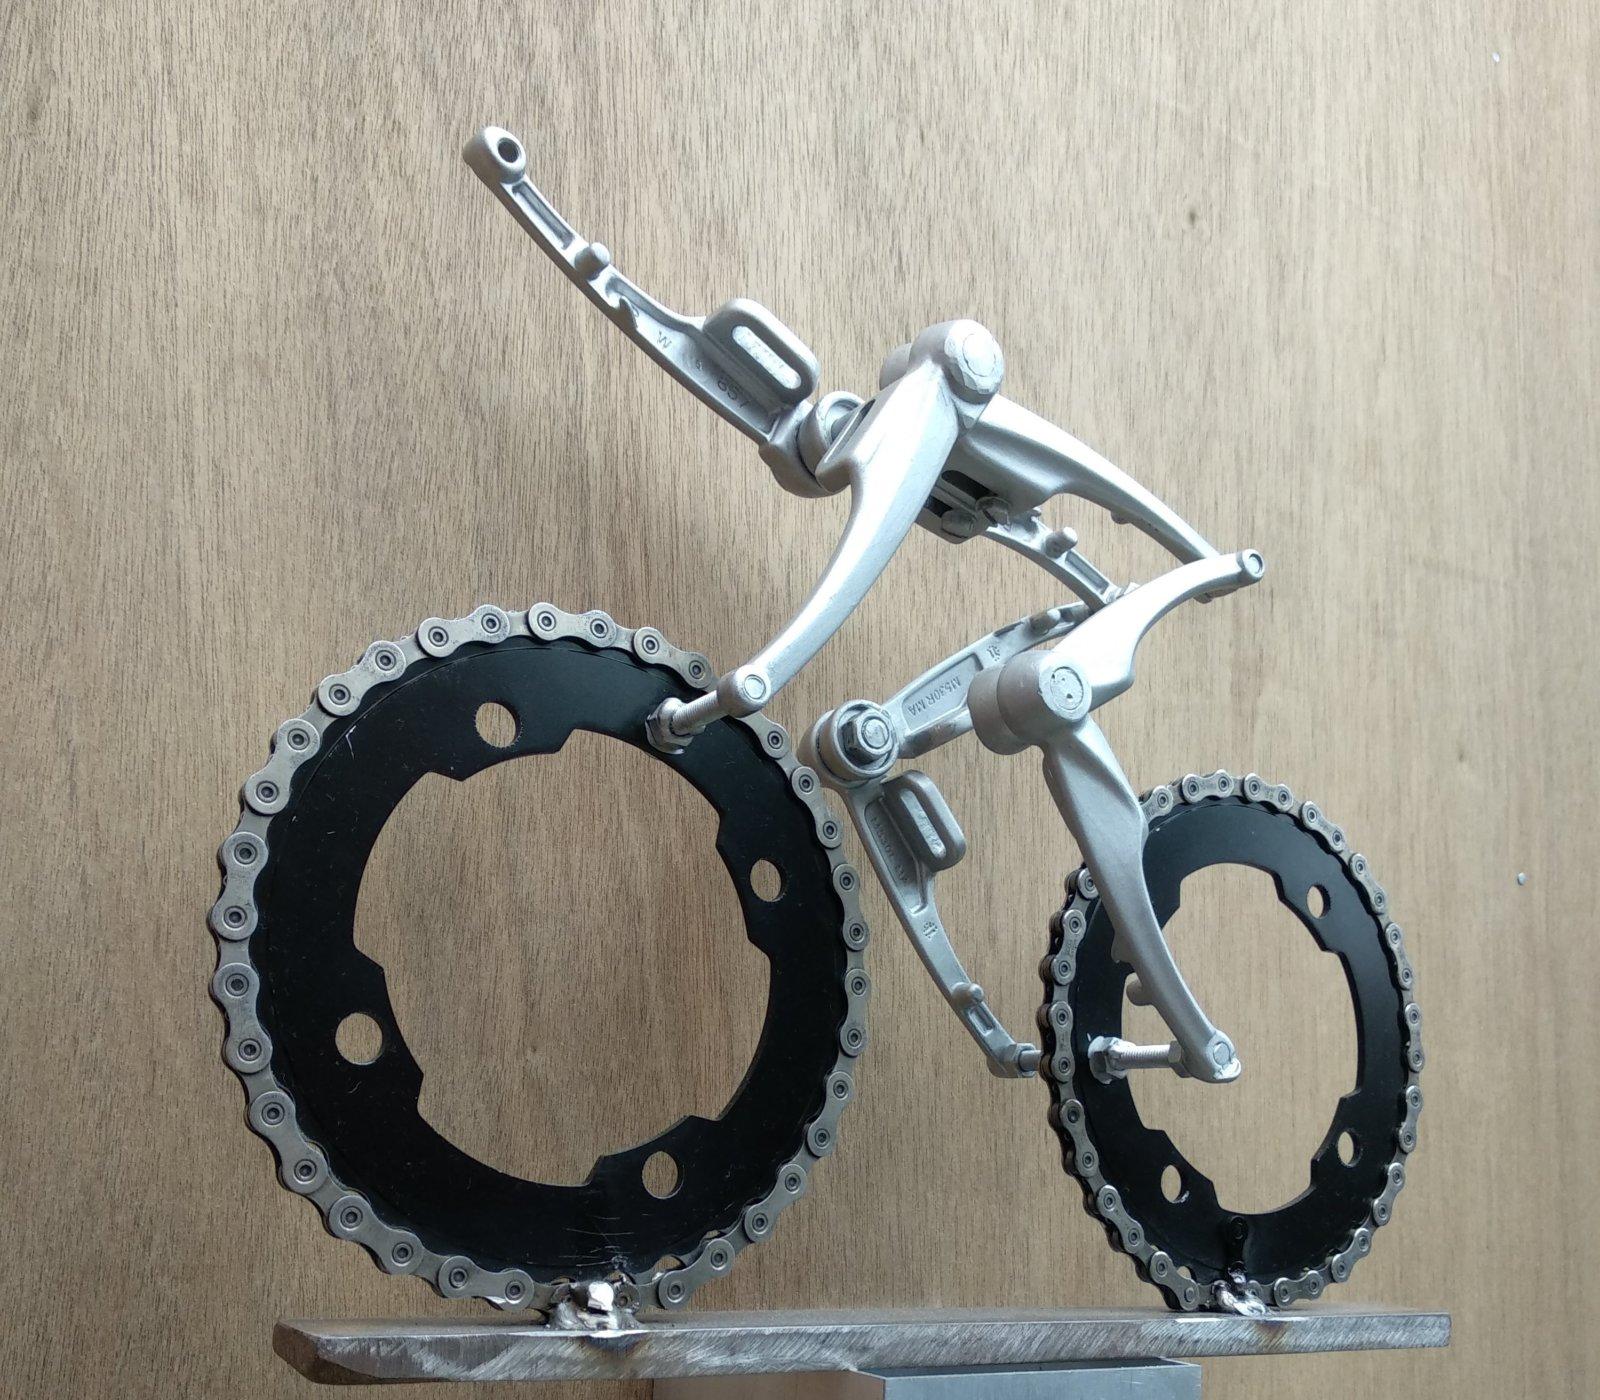 Fietskunst Bicycle Art Tom Dumoulin Etappezege Oropa Giro D\'italia 2017